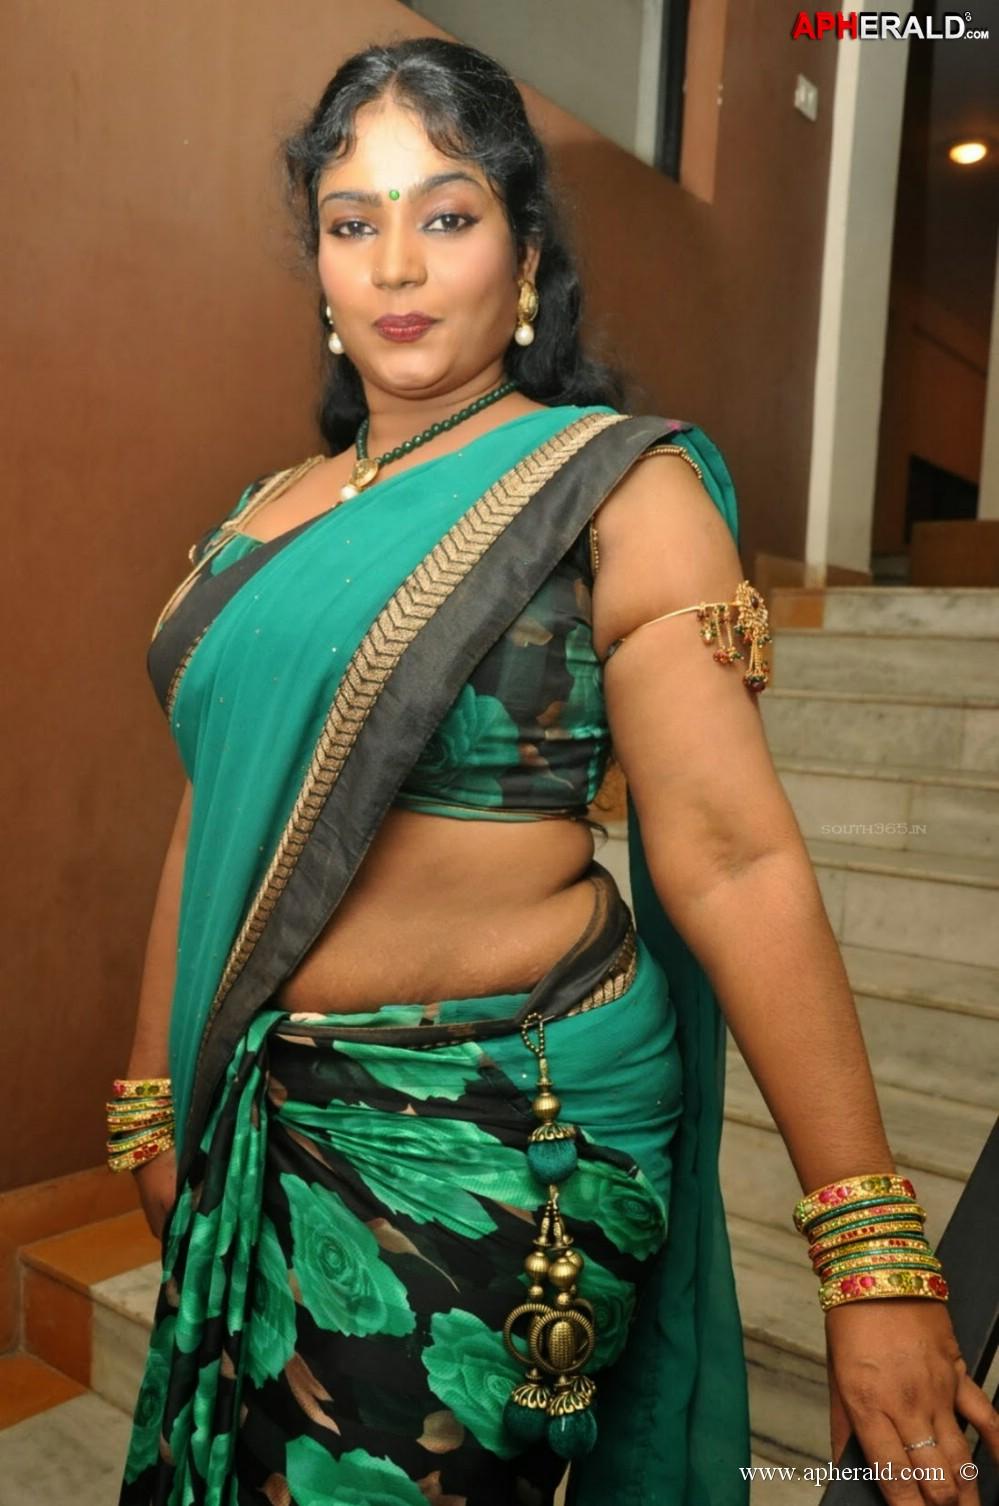 Sexy Telugu Lo  Telugu Gay Sex Stories - 2018-10-06